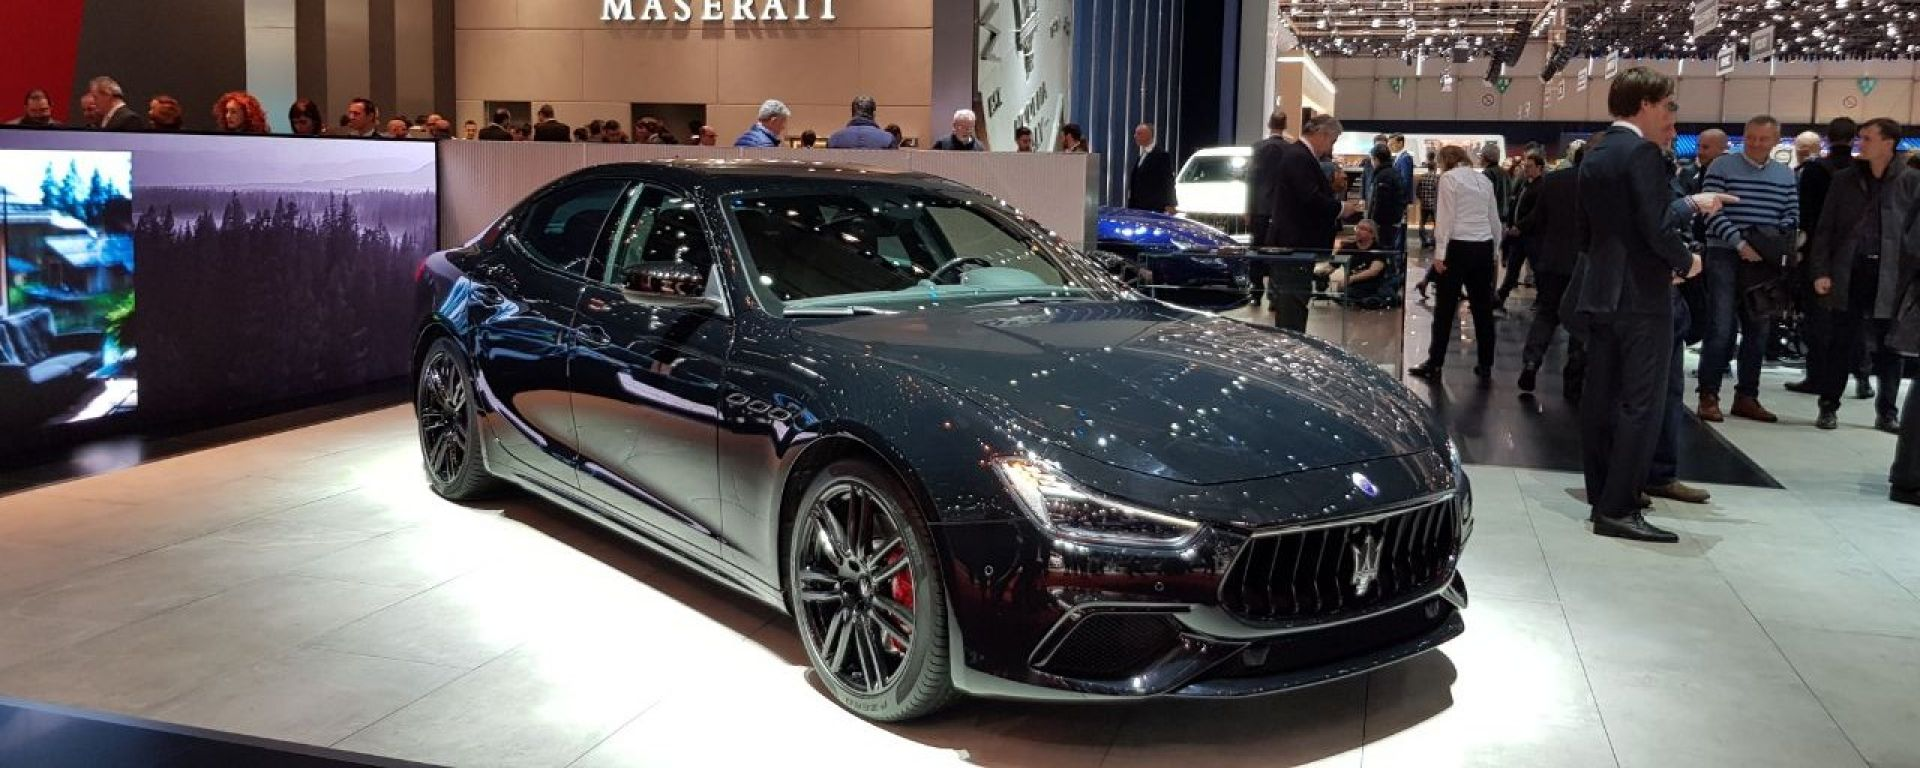 Stand Maserati, live Salone di Ginevra 2018